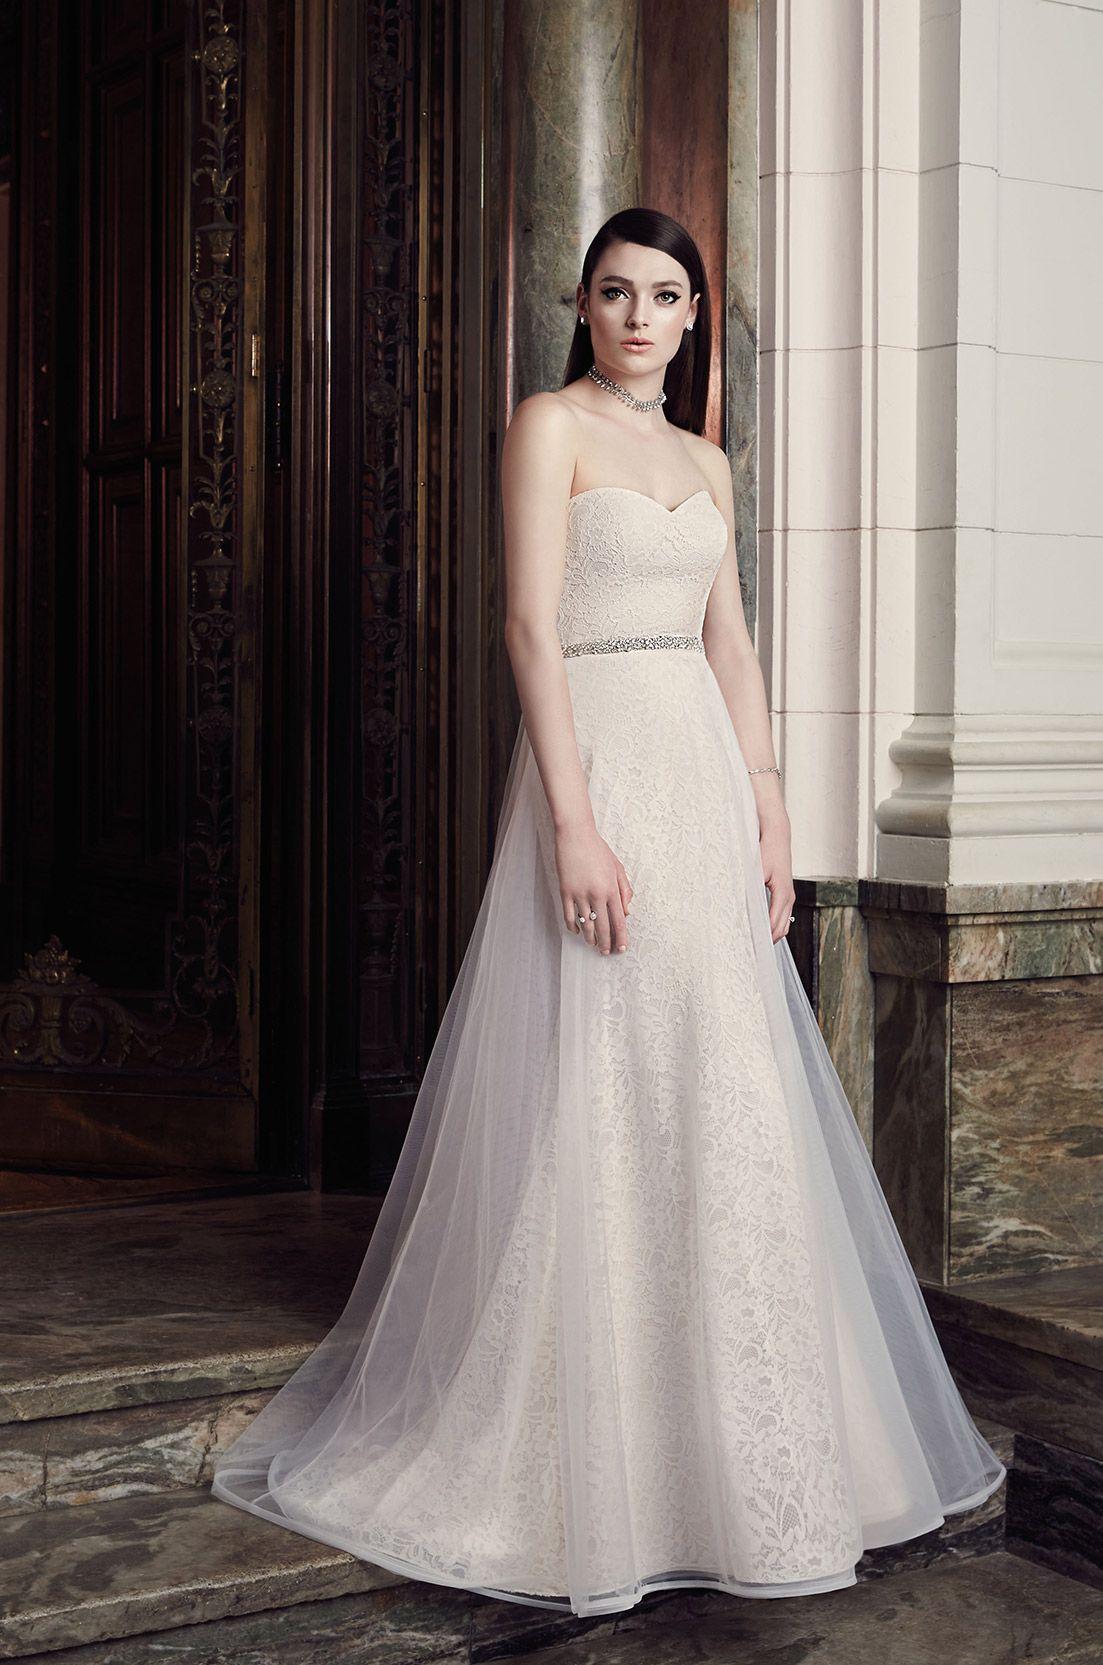 Detachable skirt wedding dress style 2009 wedding